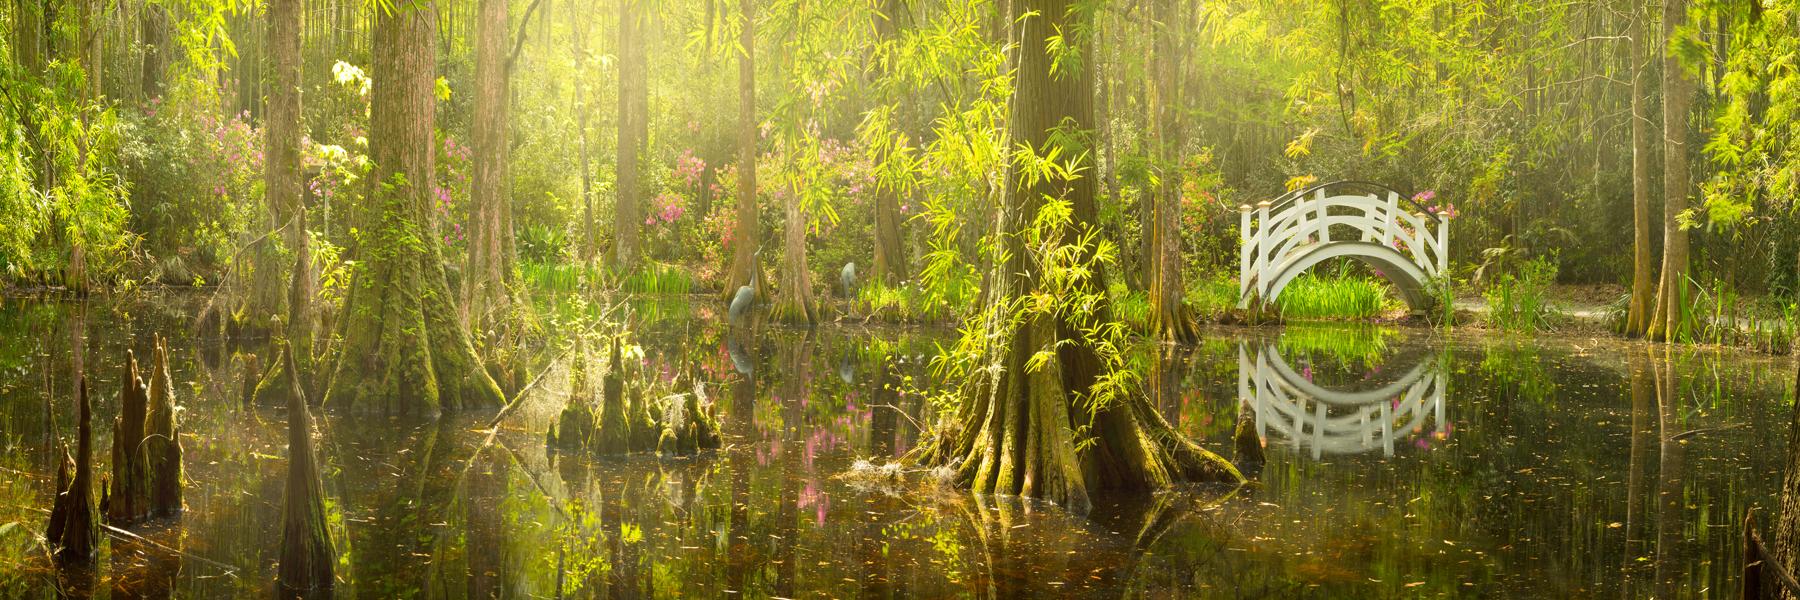 Trees - Magnolia Gardens swamp.jpg